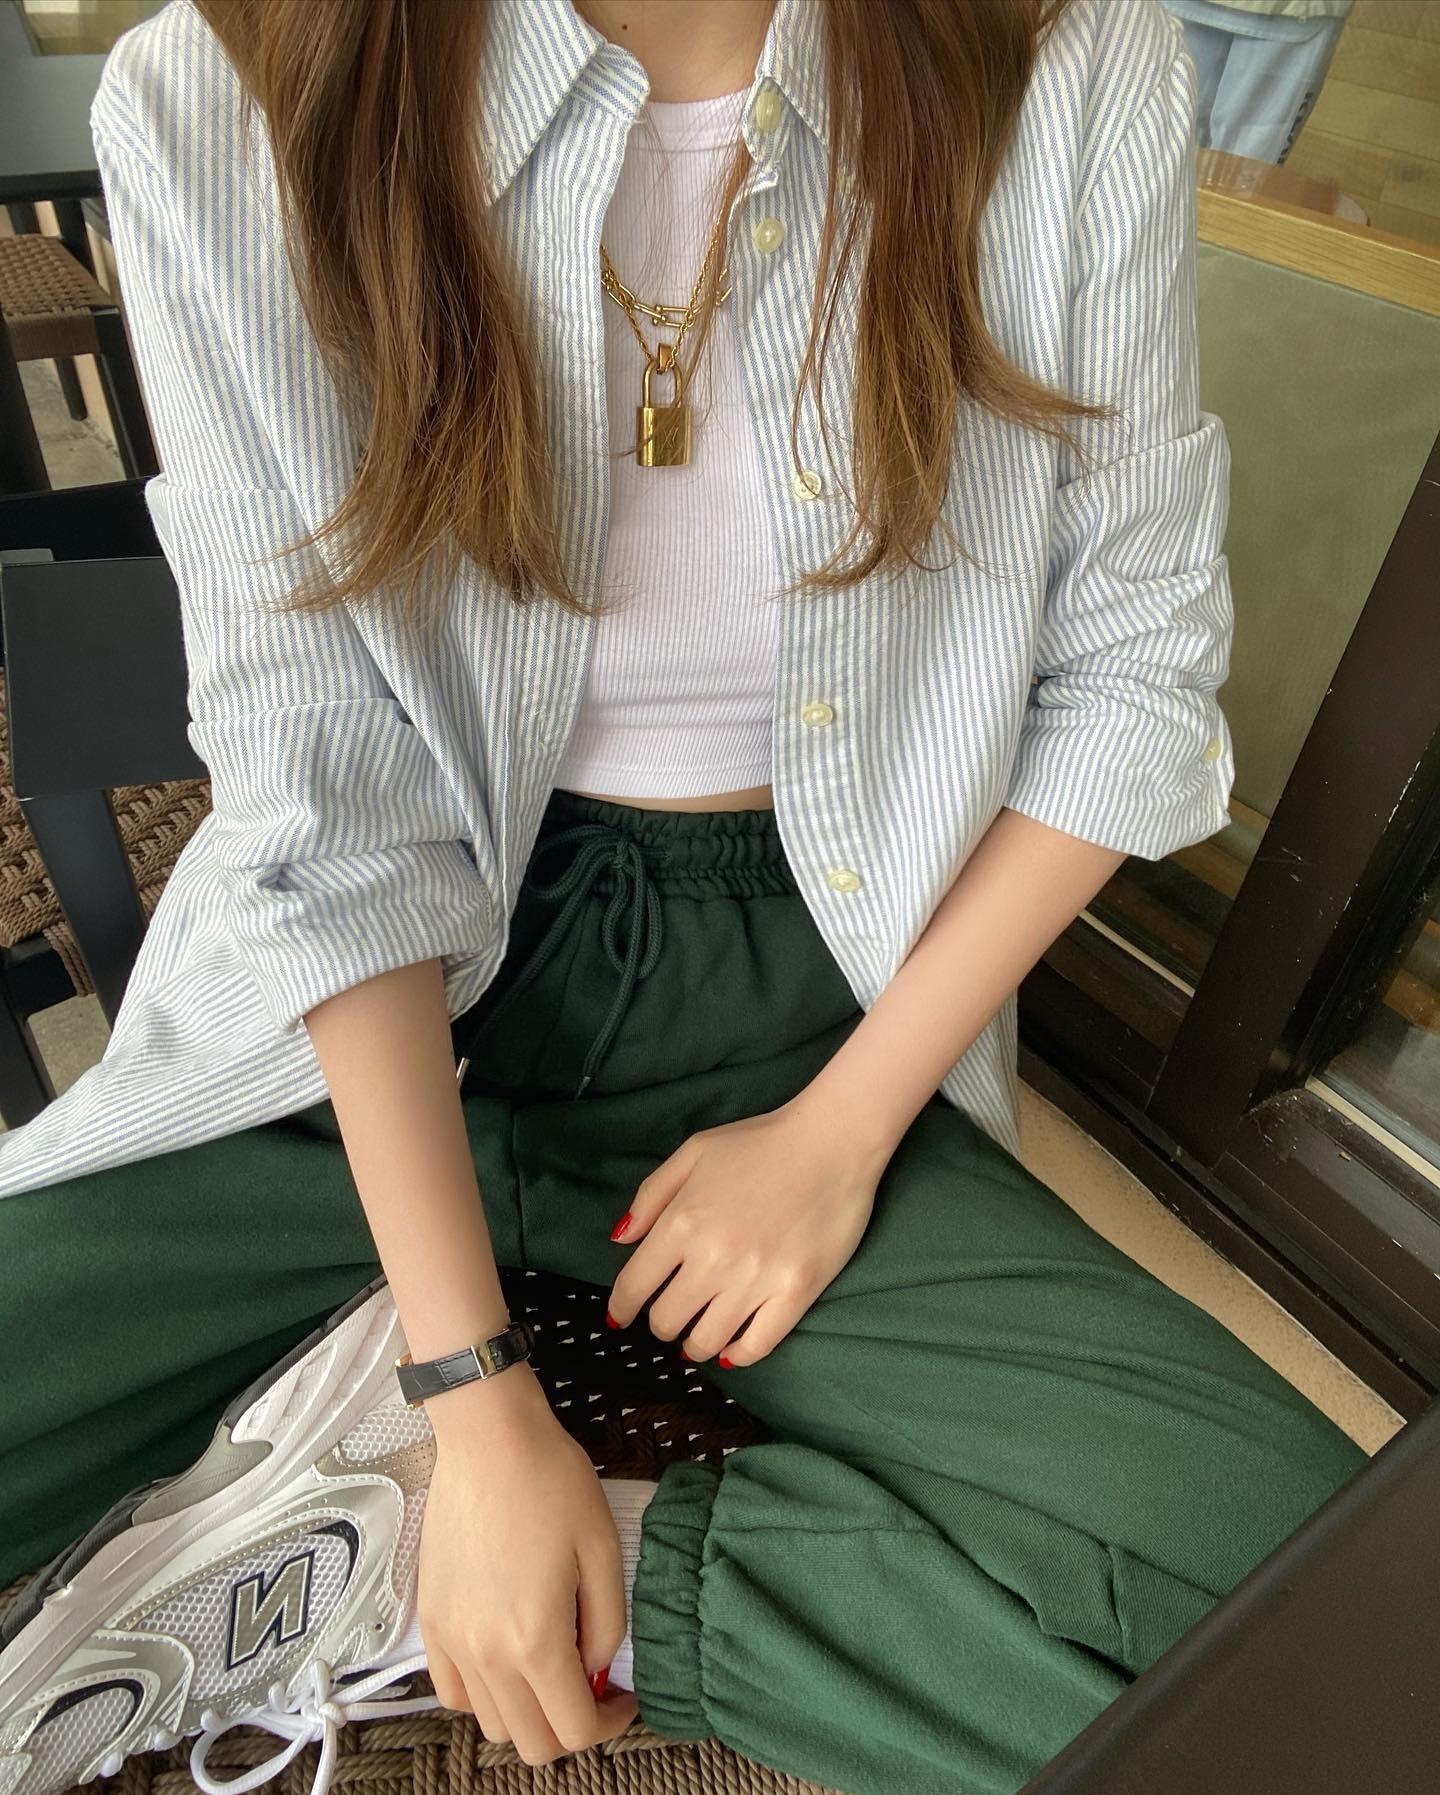 DAYNYC luxury necklace(gold)